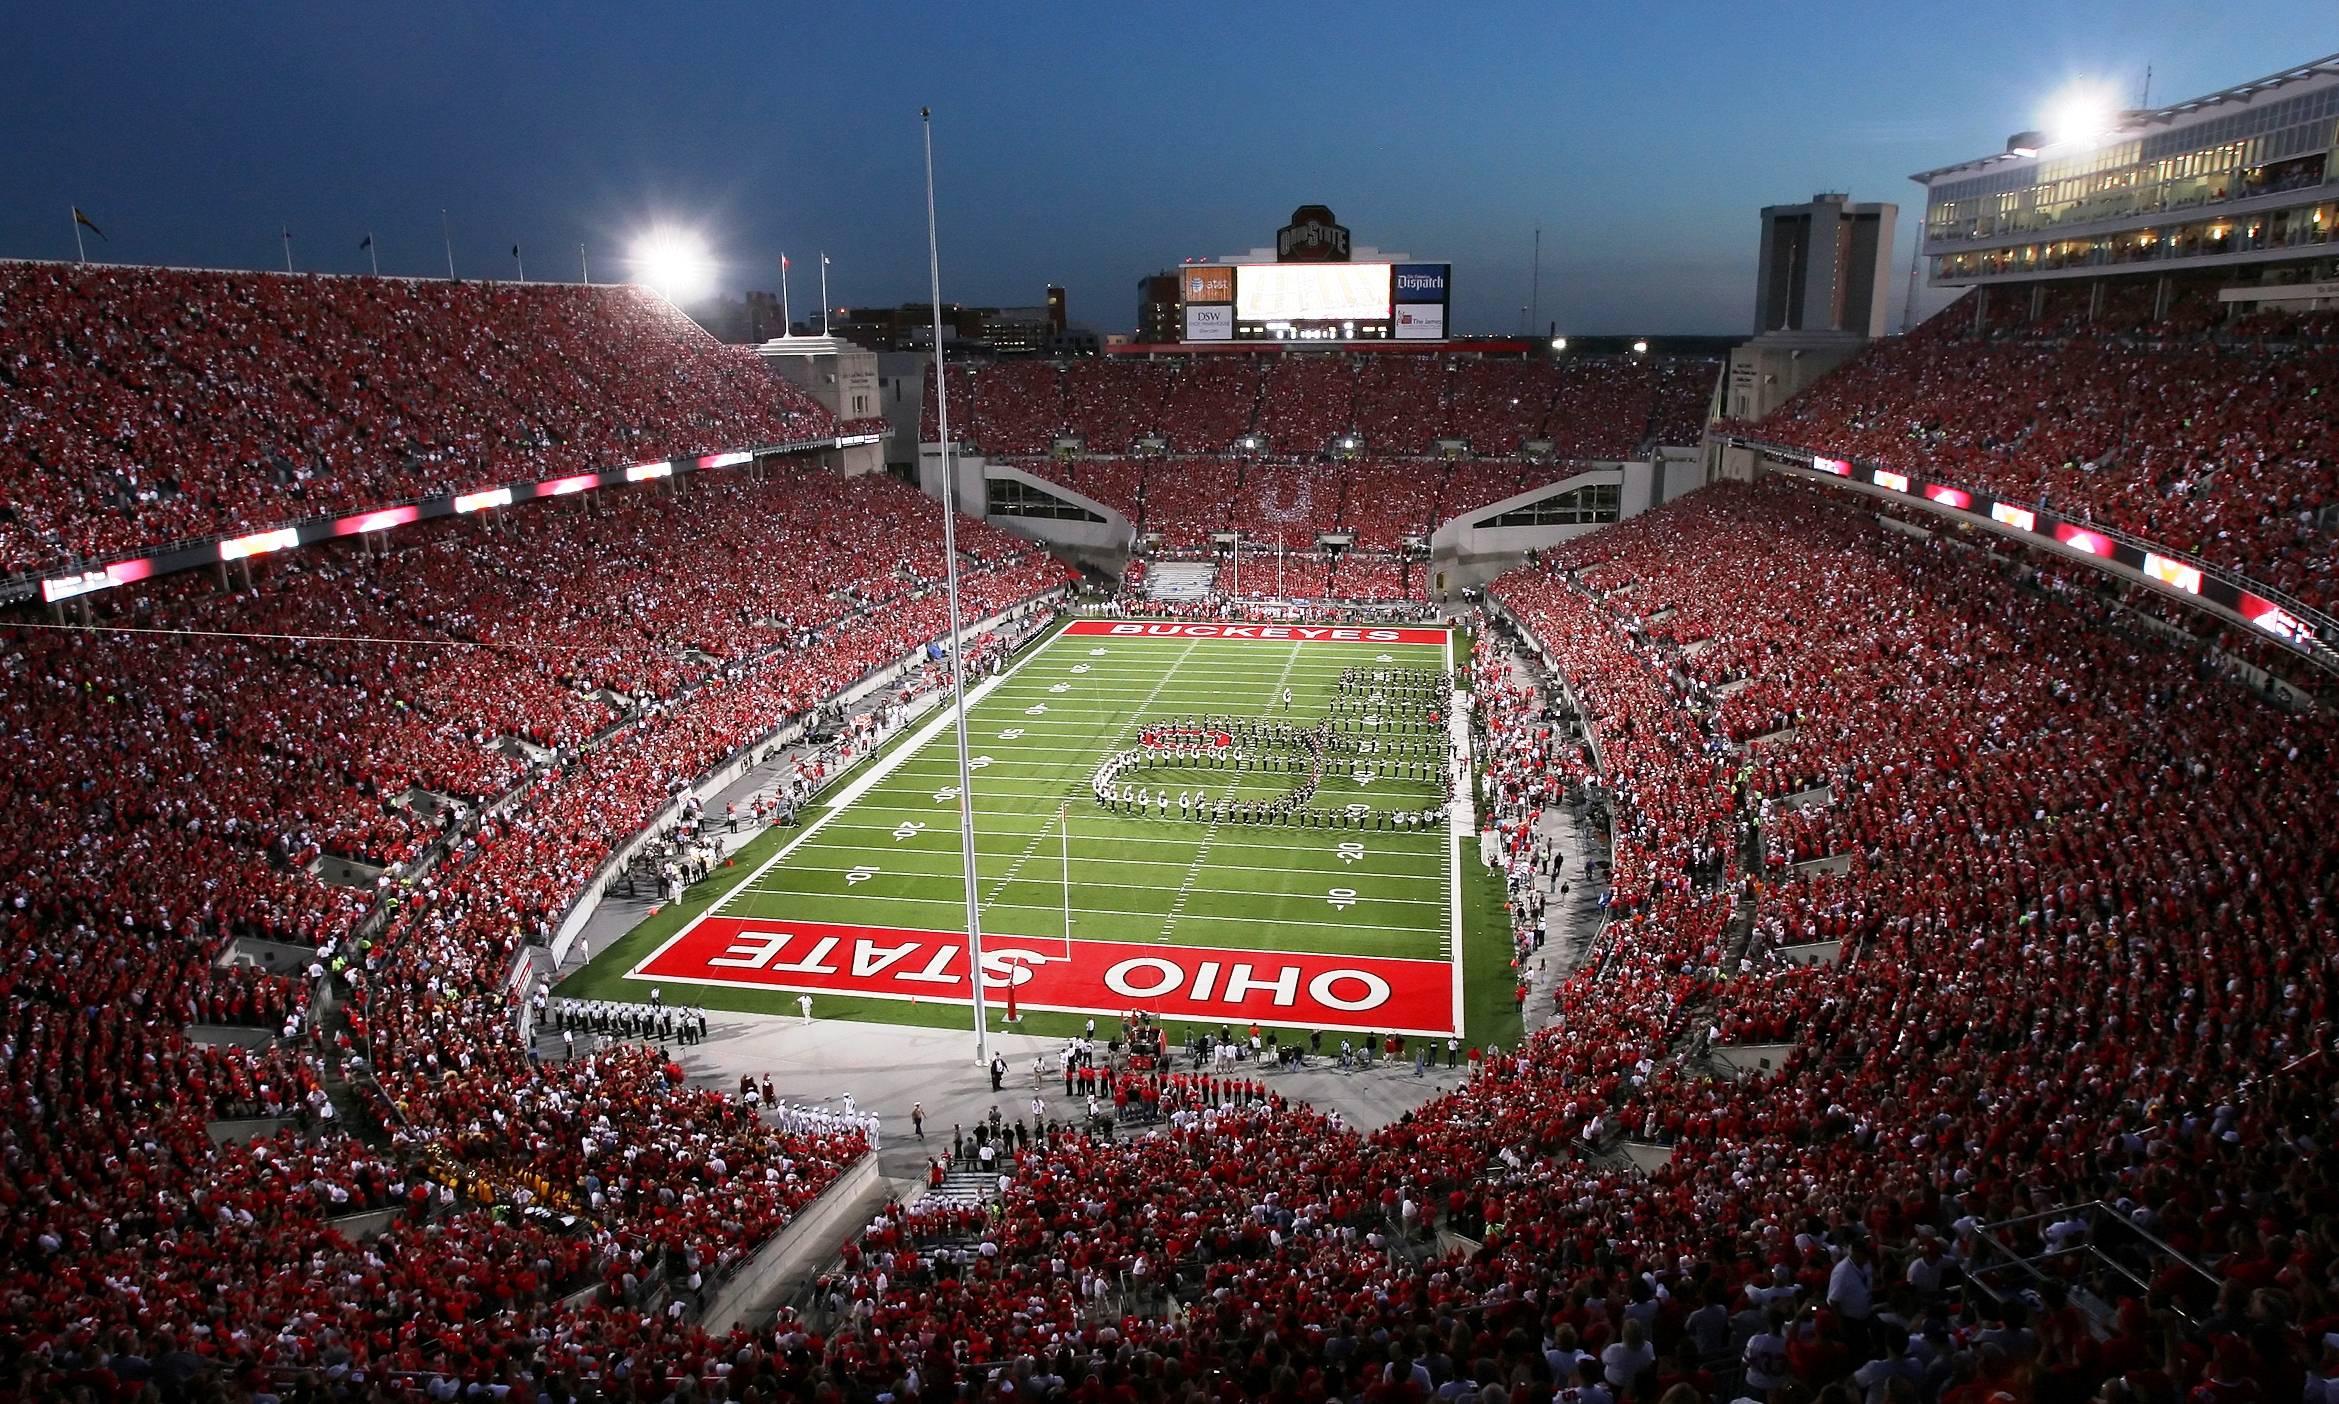 OHIO STATE BUCKEYES college football 23 wallpaper 2339x1404 2339x1404